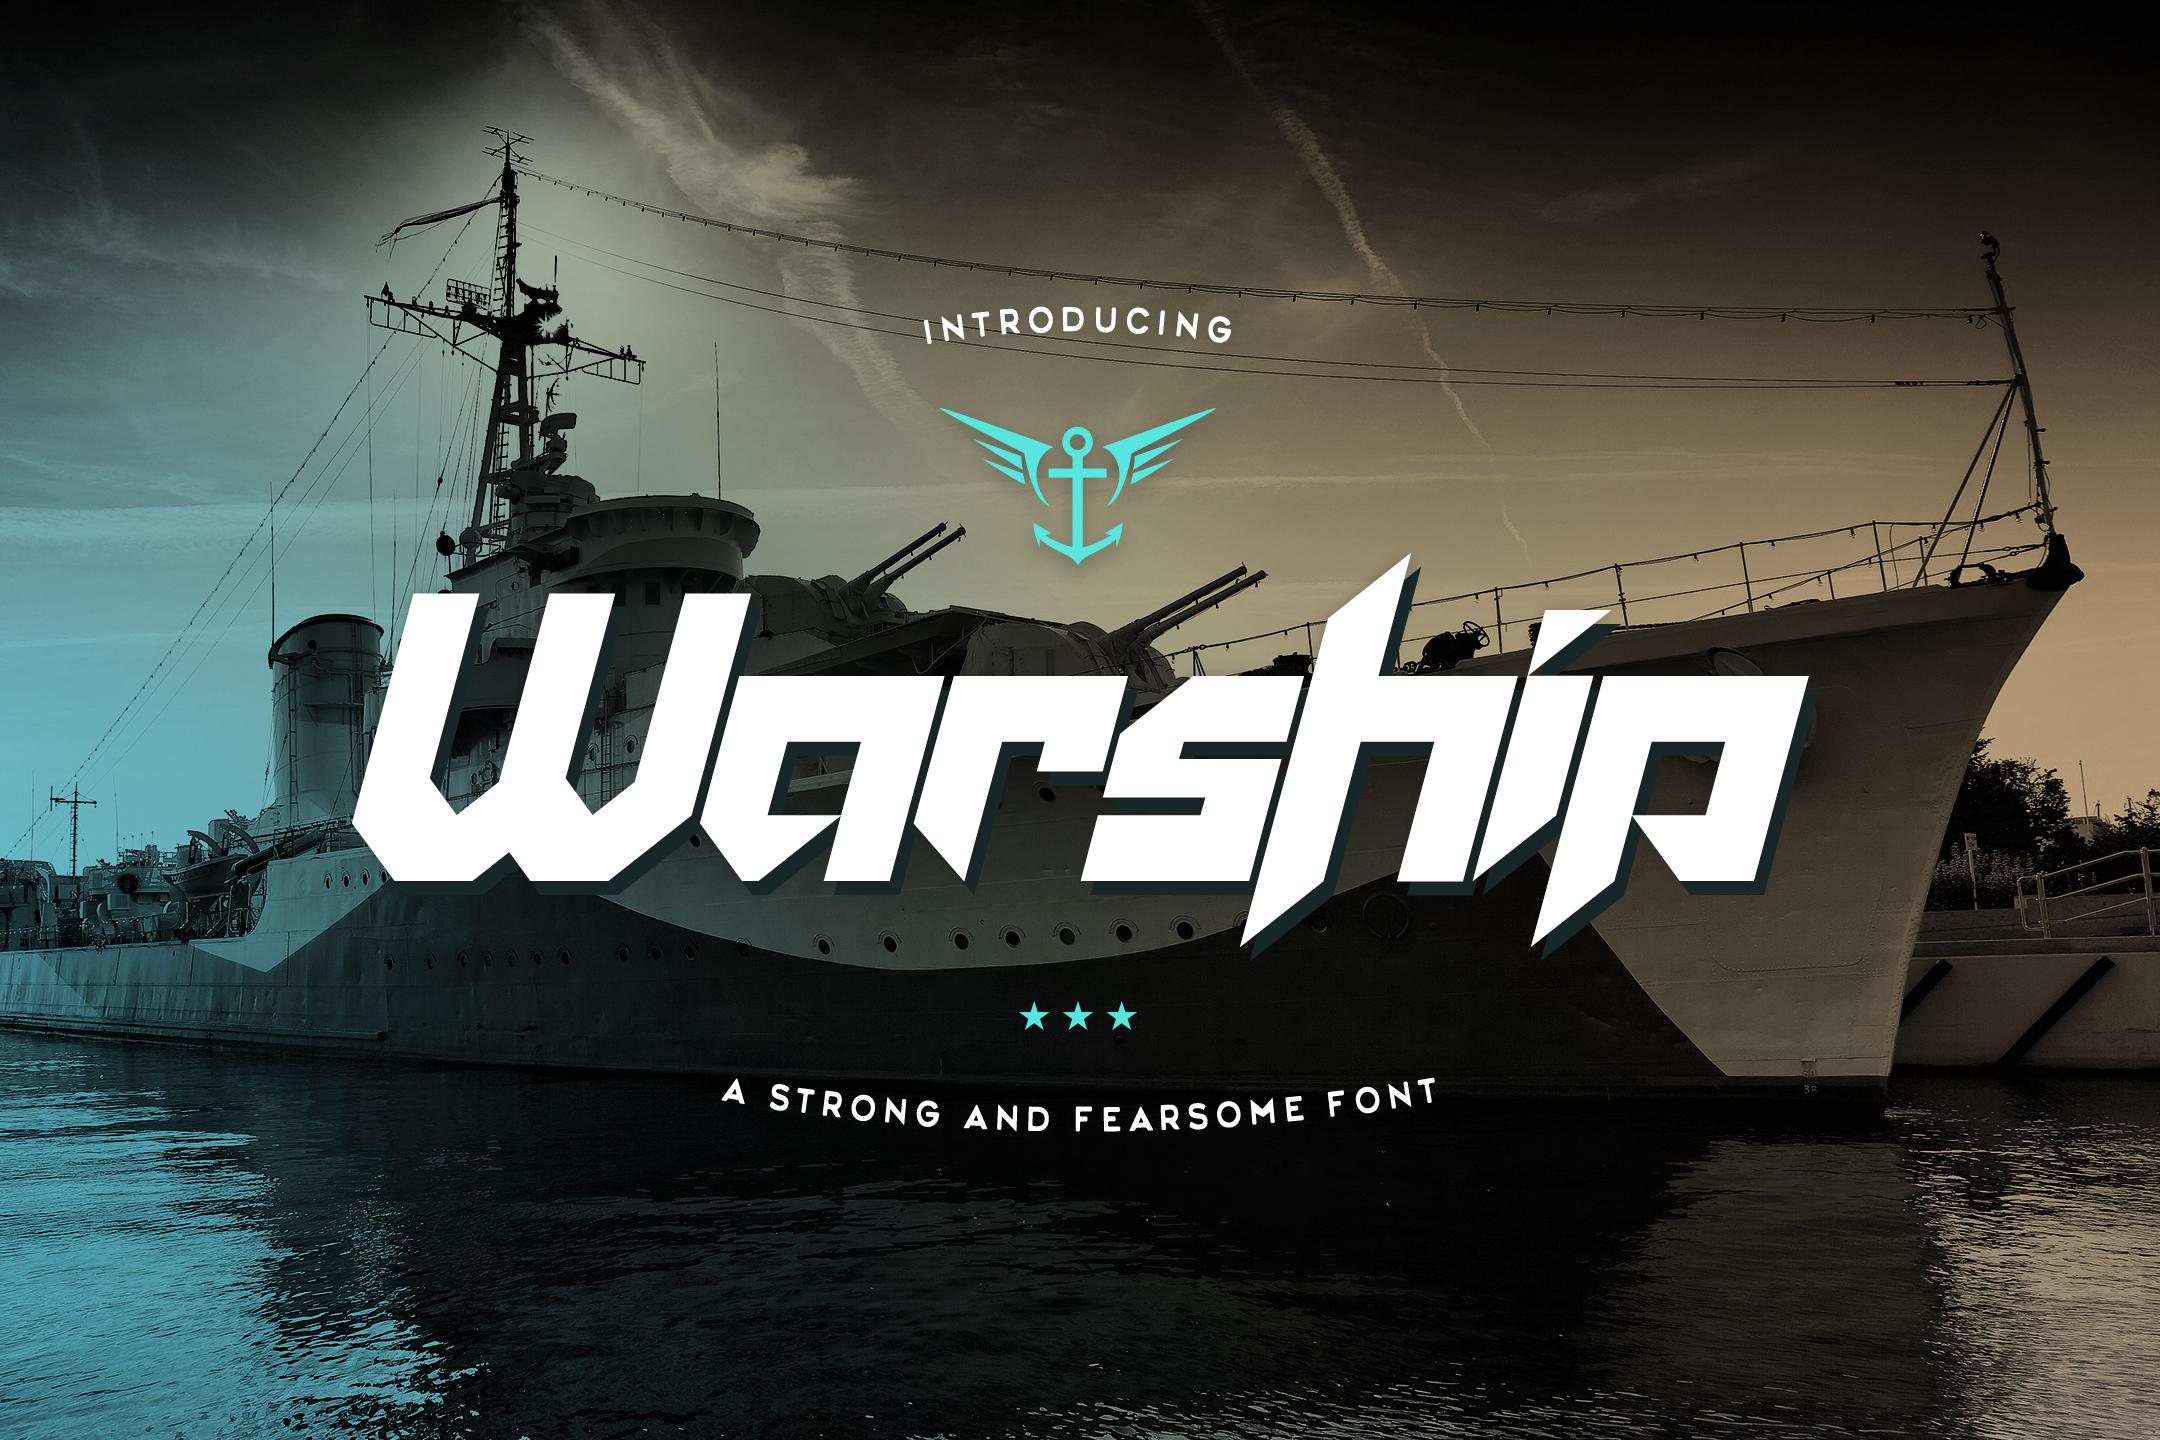 Warship example image 1